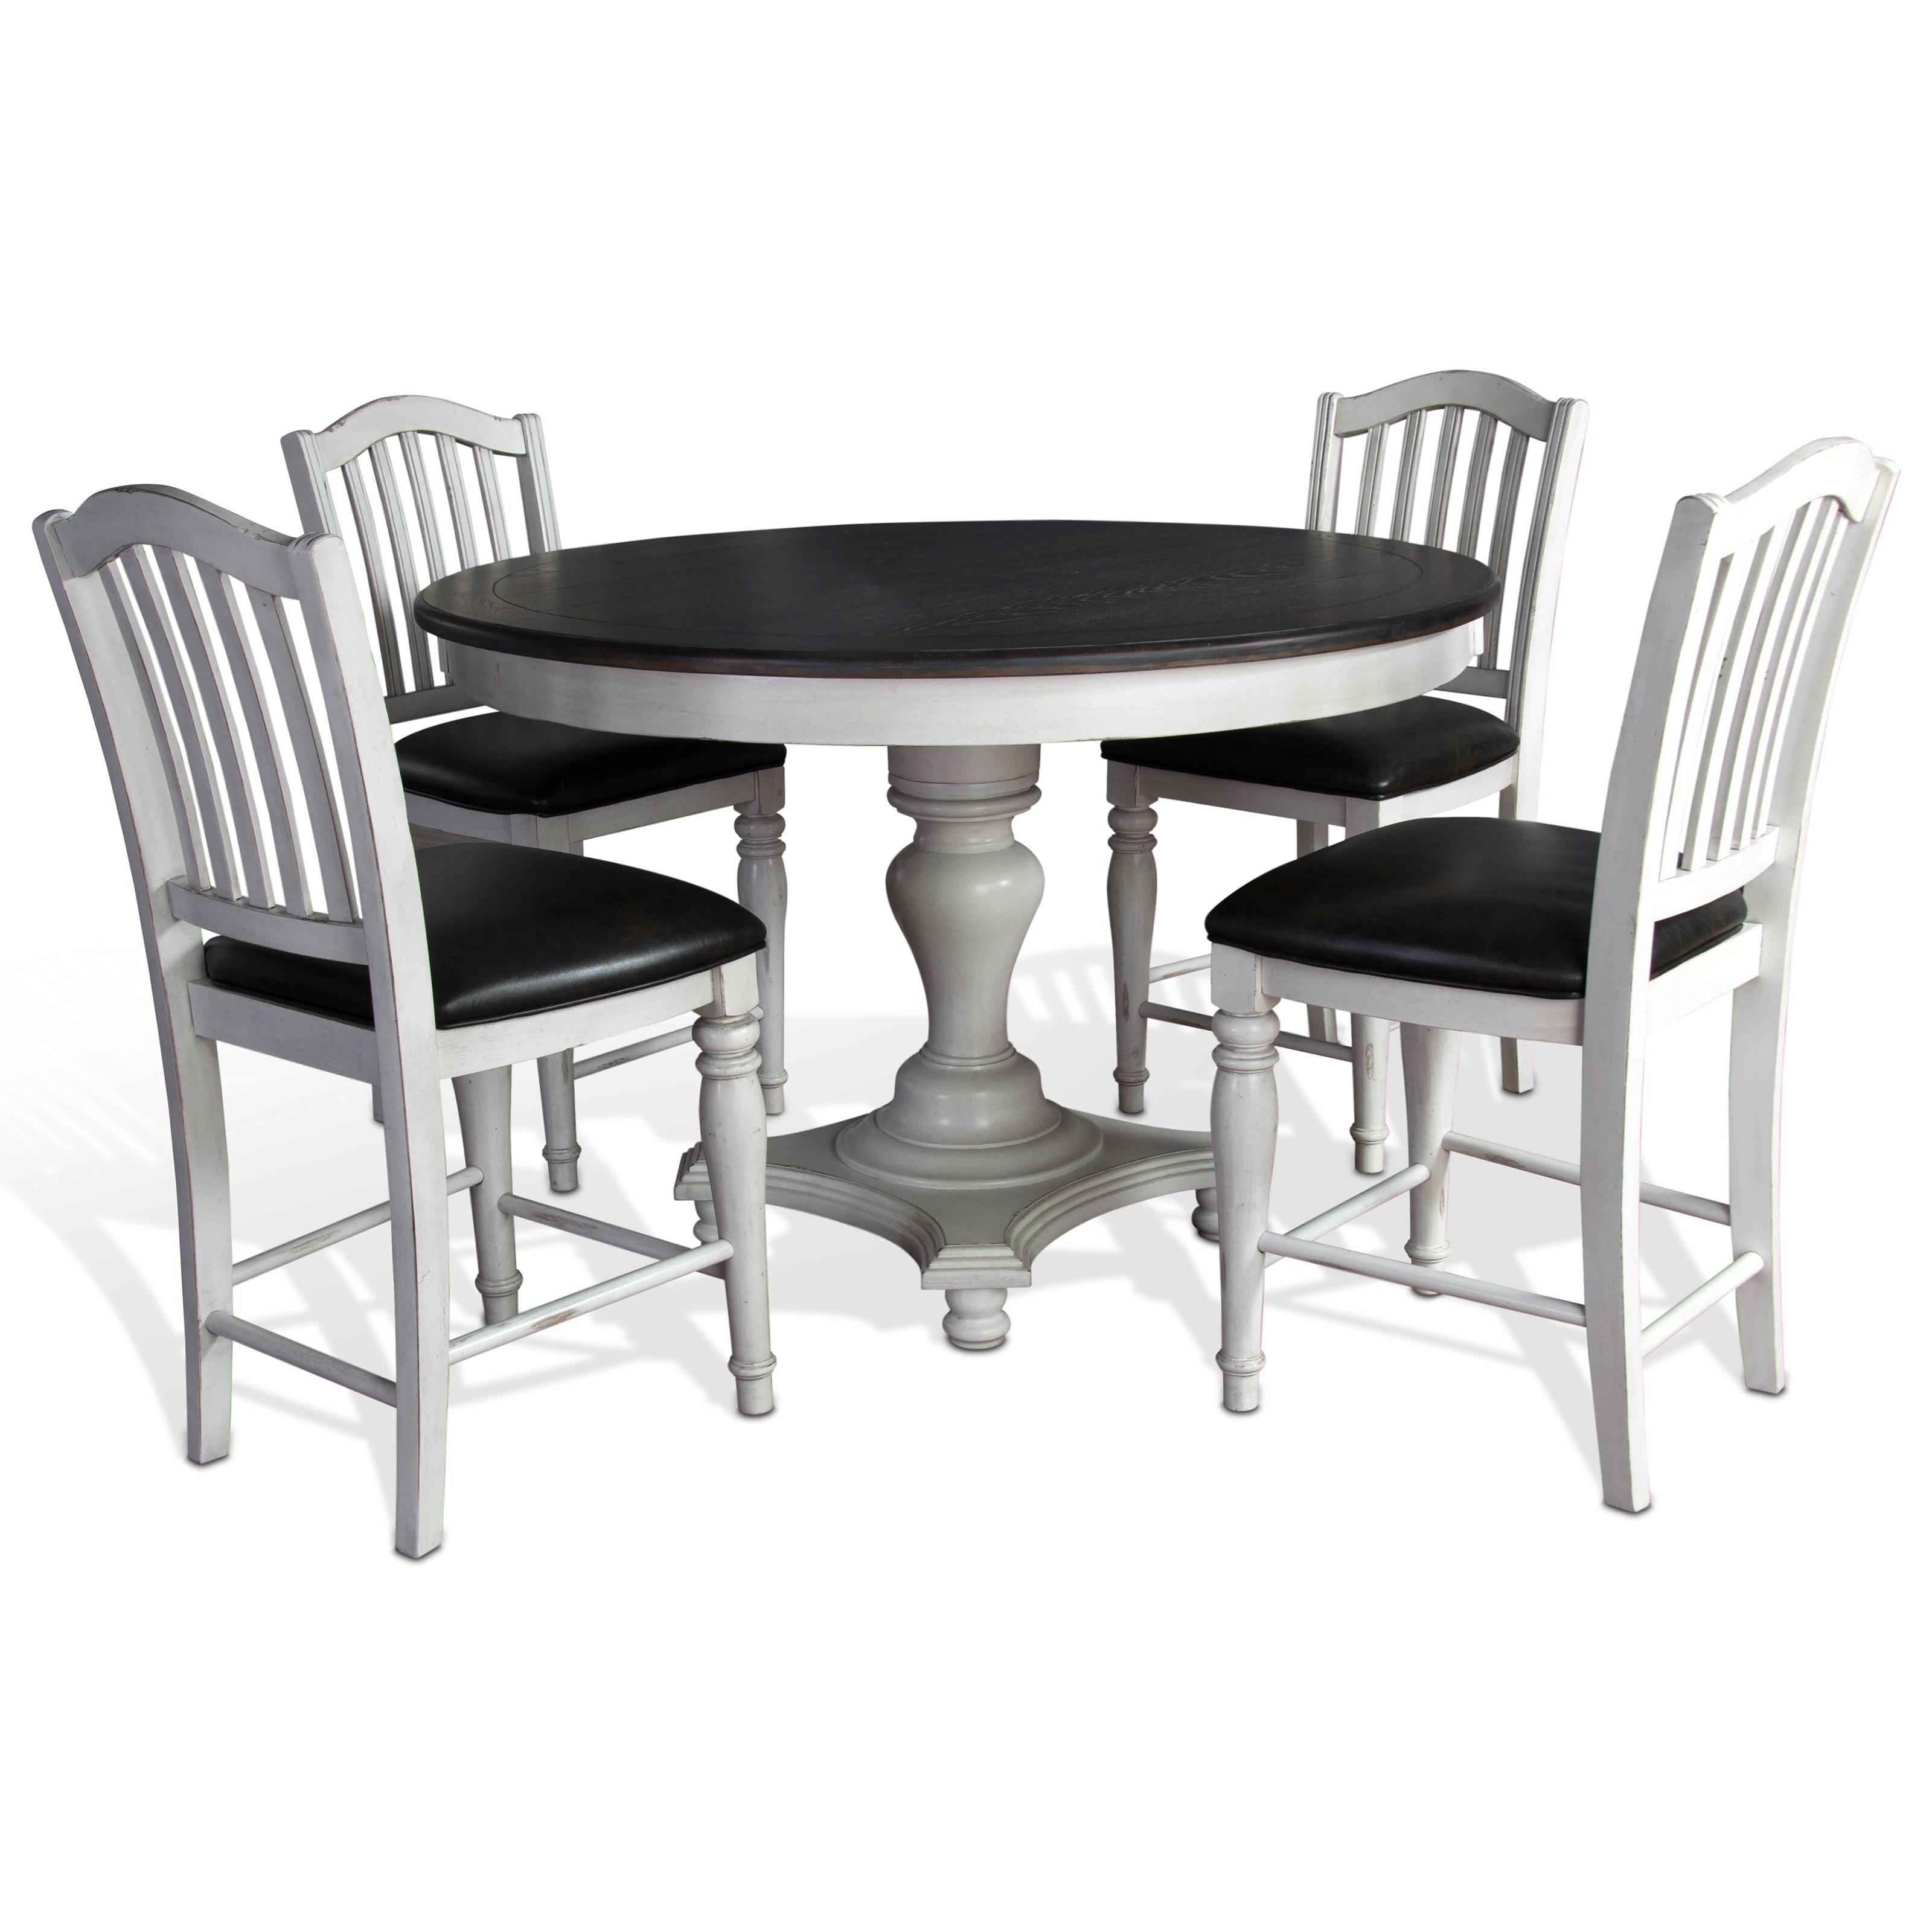 Charmant Sunny Designs Bourbon County 5 Piece Round Table U0026 Chair Set